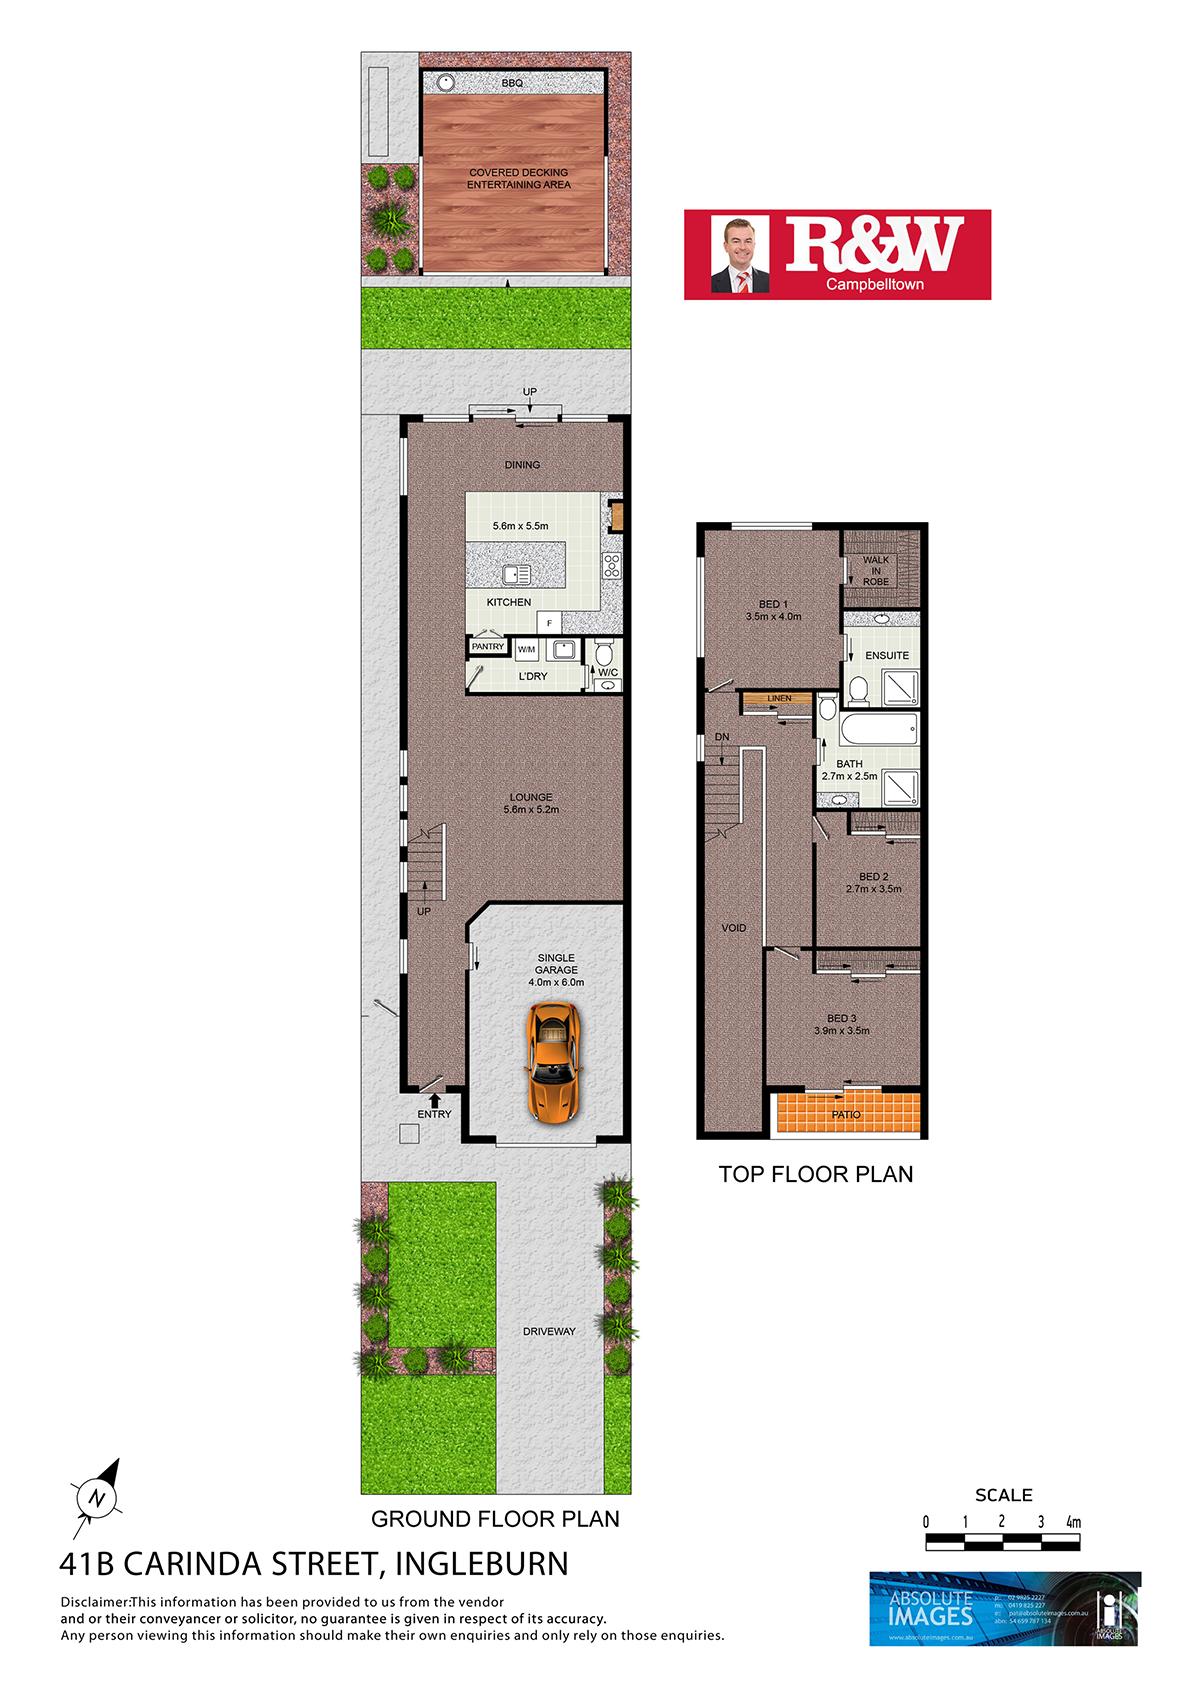 41B-Carinda-Street-Ingleburn----WEB